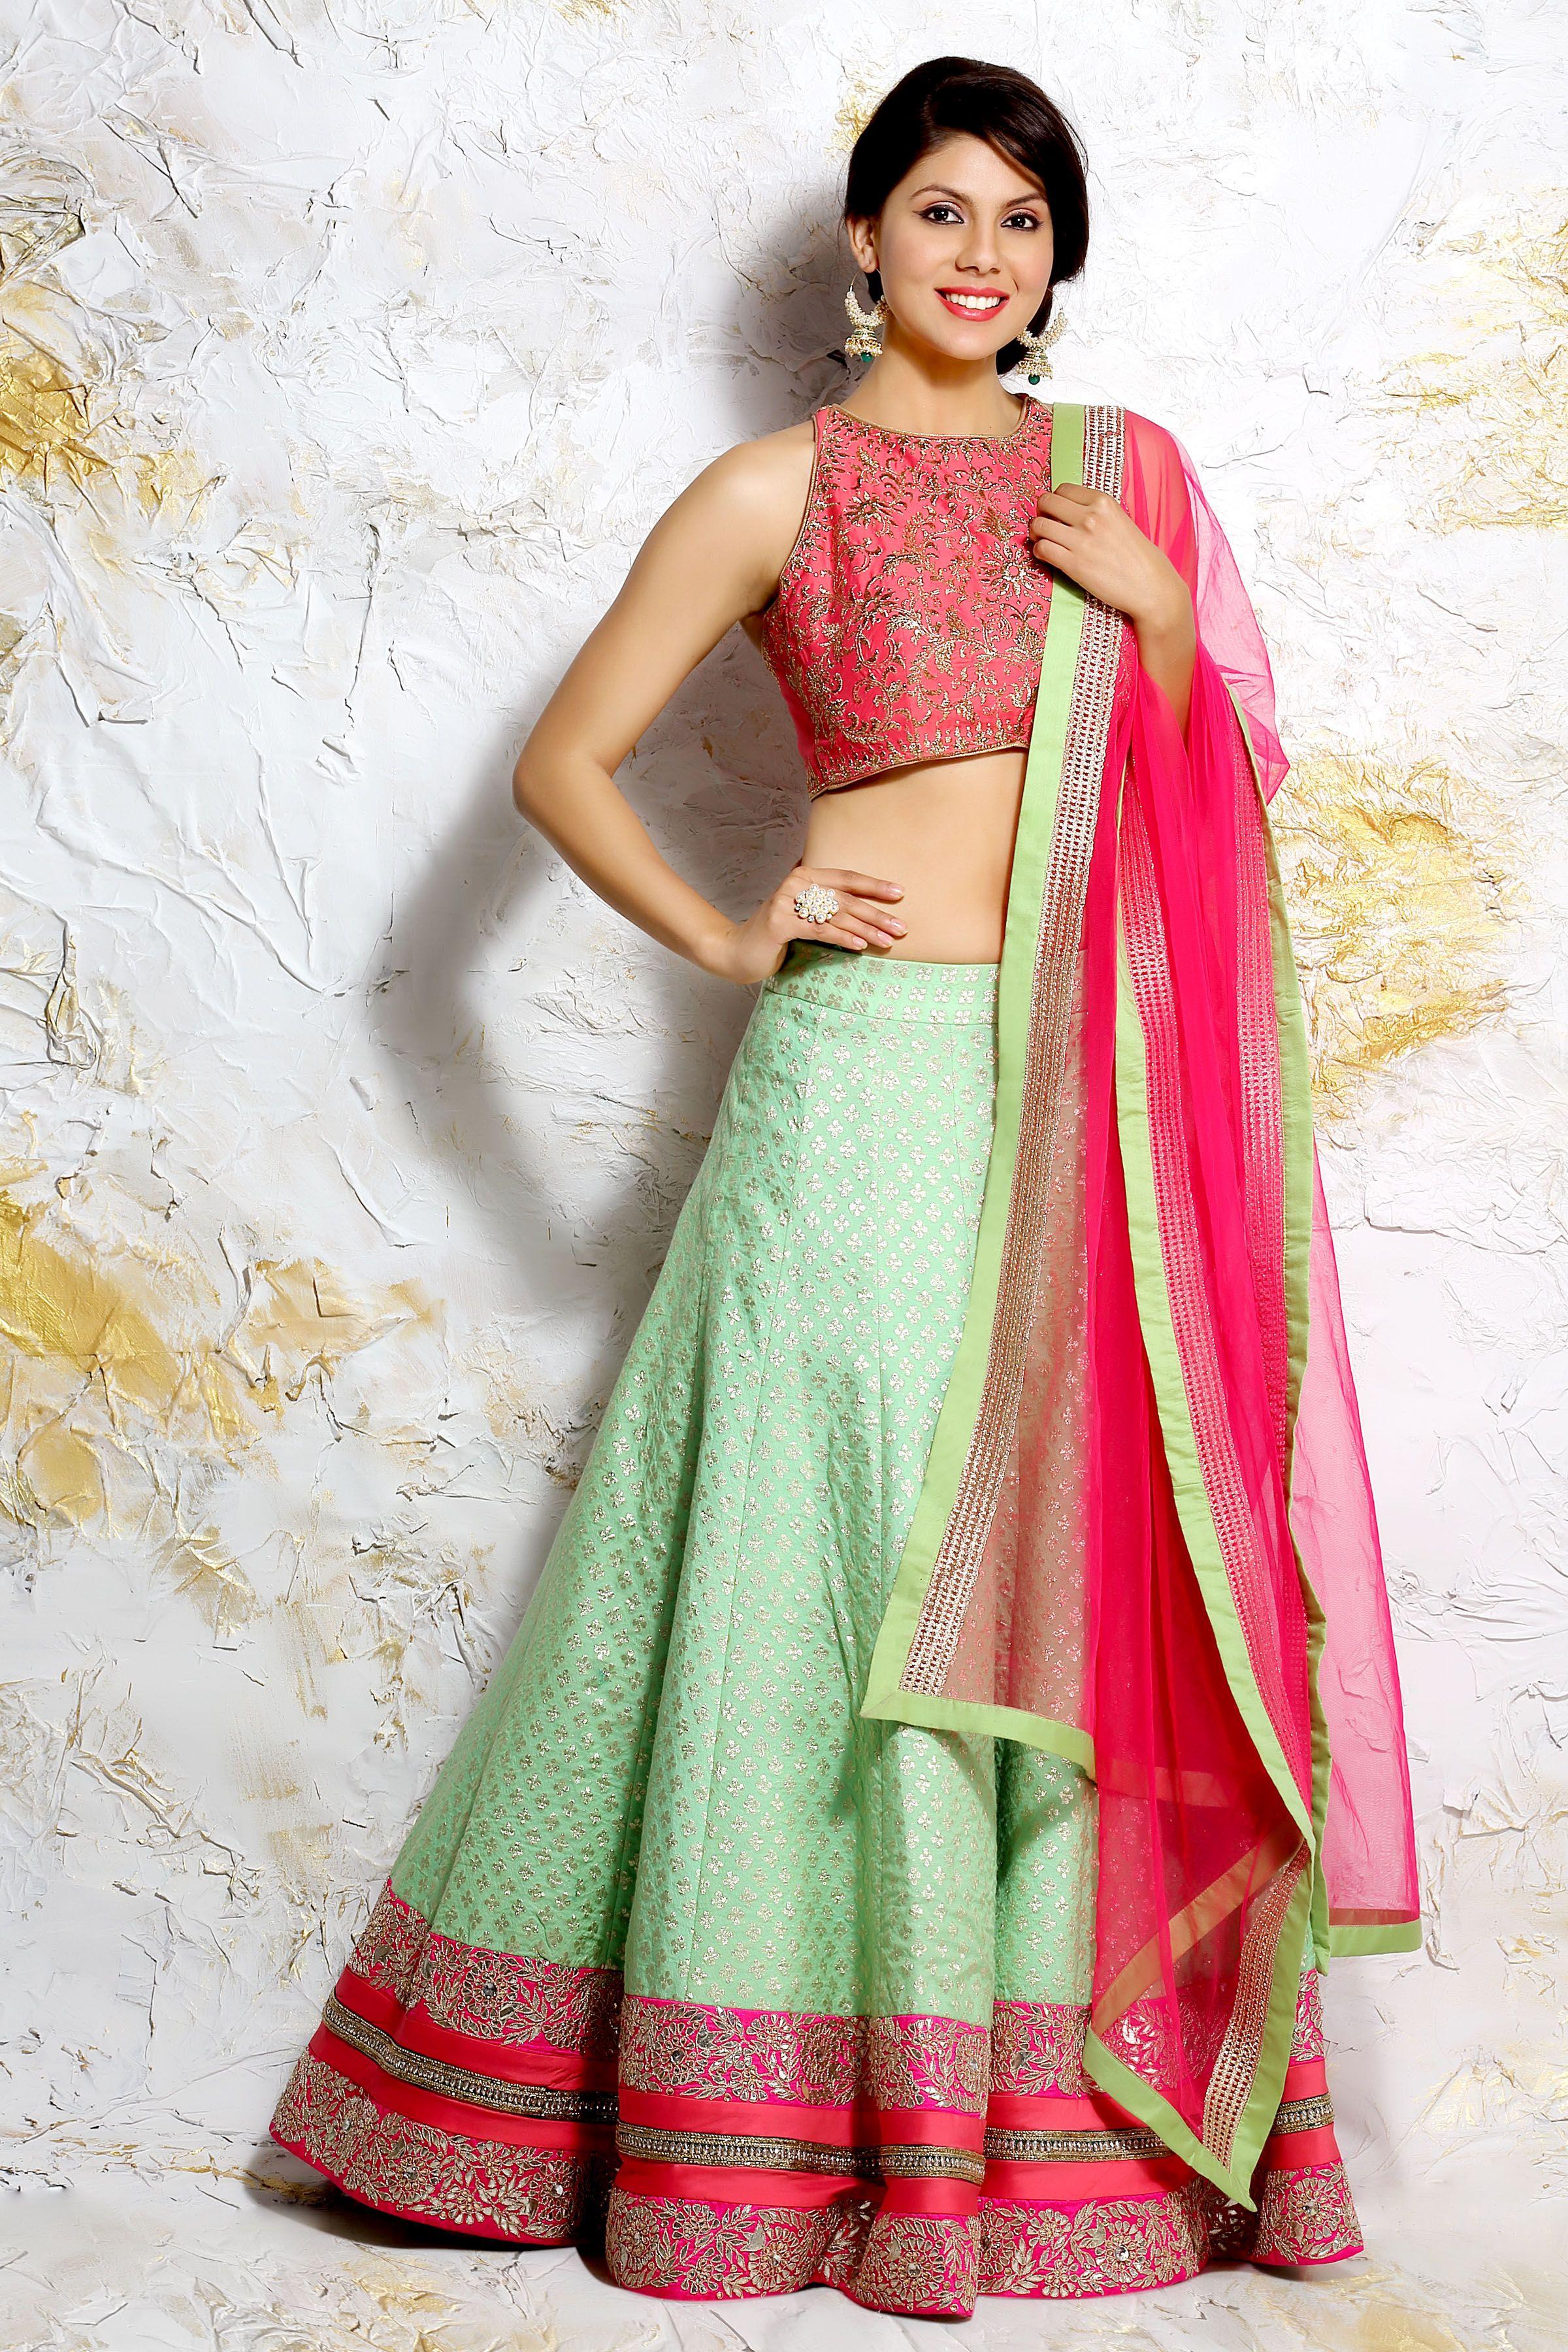 Indian Women Salwar Kameez Traditional Embroidered Designer Bollywood Wedding Festival Sangeet Dress Material.